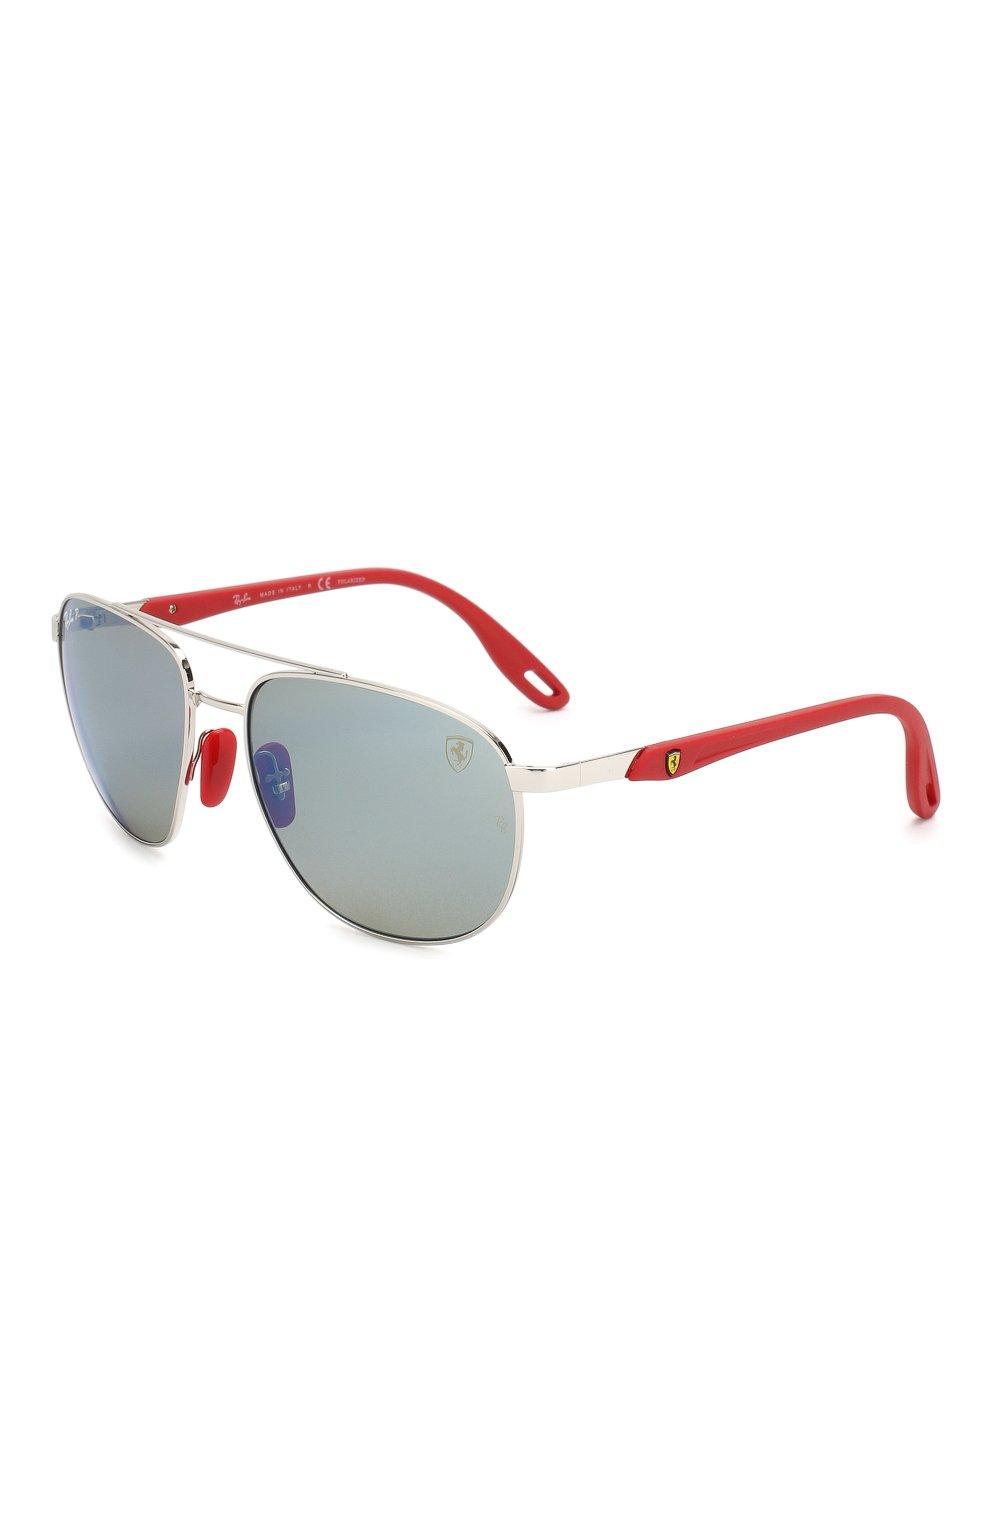 Мужские солнцезащитные очки RAY-BAN серебряного цвета, арт. 3659M-F031H0   Фото 1